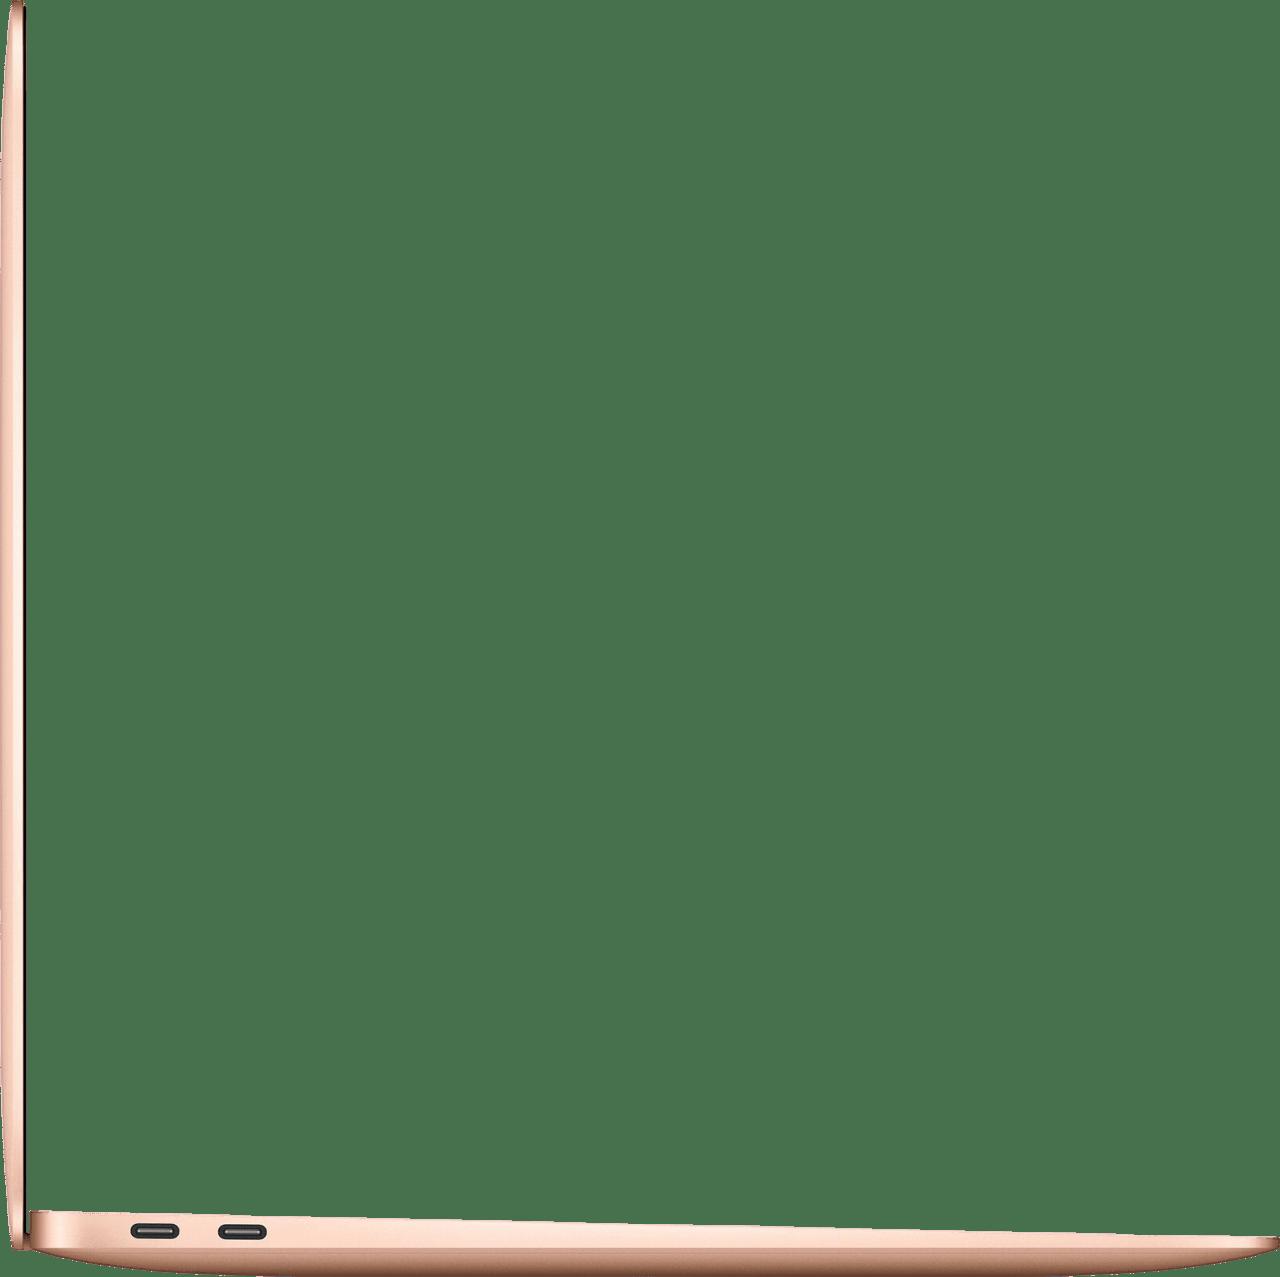 Gold Apple MacBook Air (Late 2020) - English (QWERTY) Laptop - Apple M1 - 8GB - 256GB SSD - Apple Integrated 7-core GPU.3